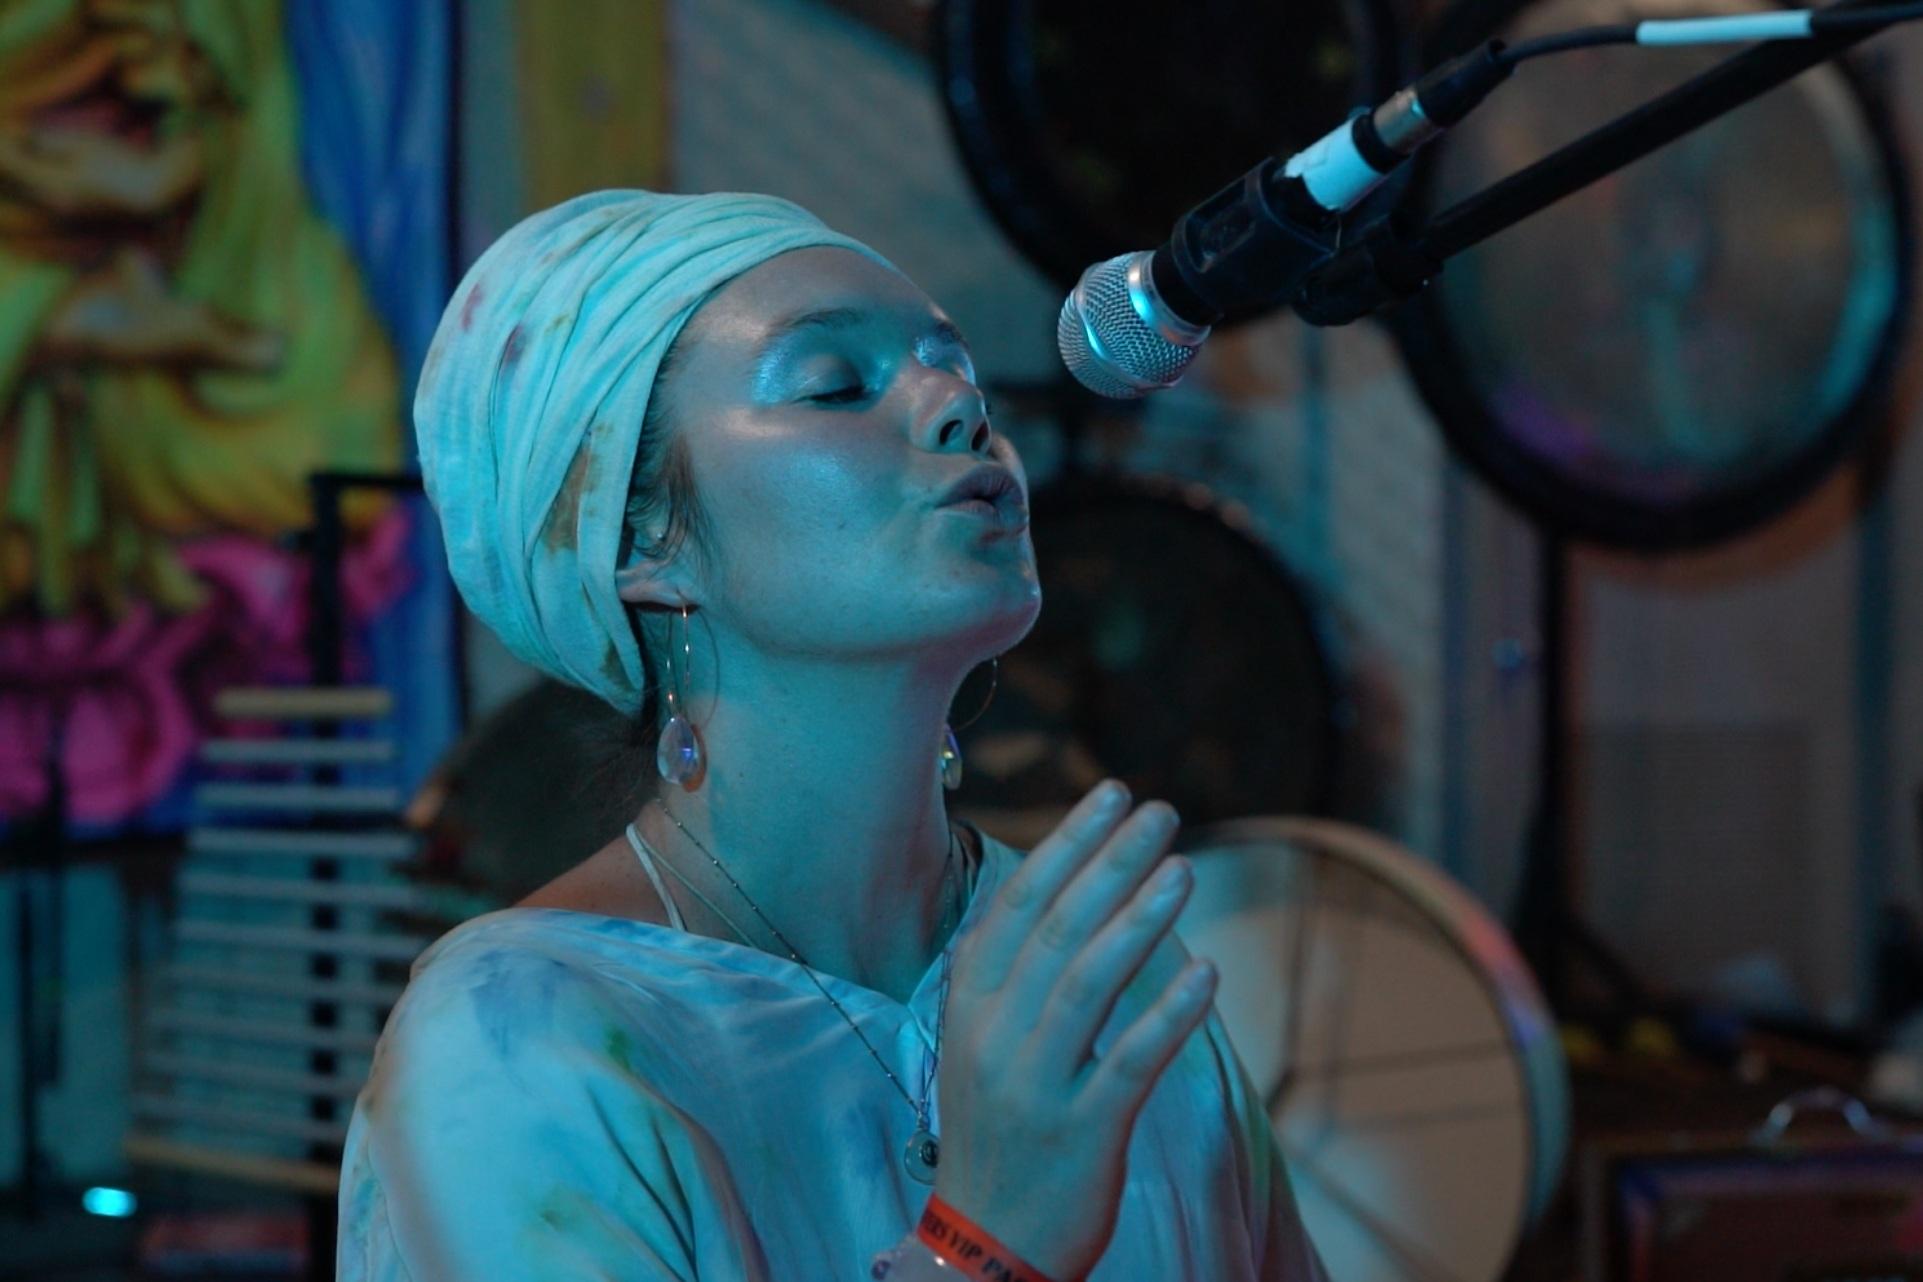 Jai Chand Kaur - Kundalini Yoga and Meditation Teacher, Mantra Music Artistinstagram.com/jaichandkaur